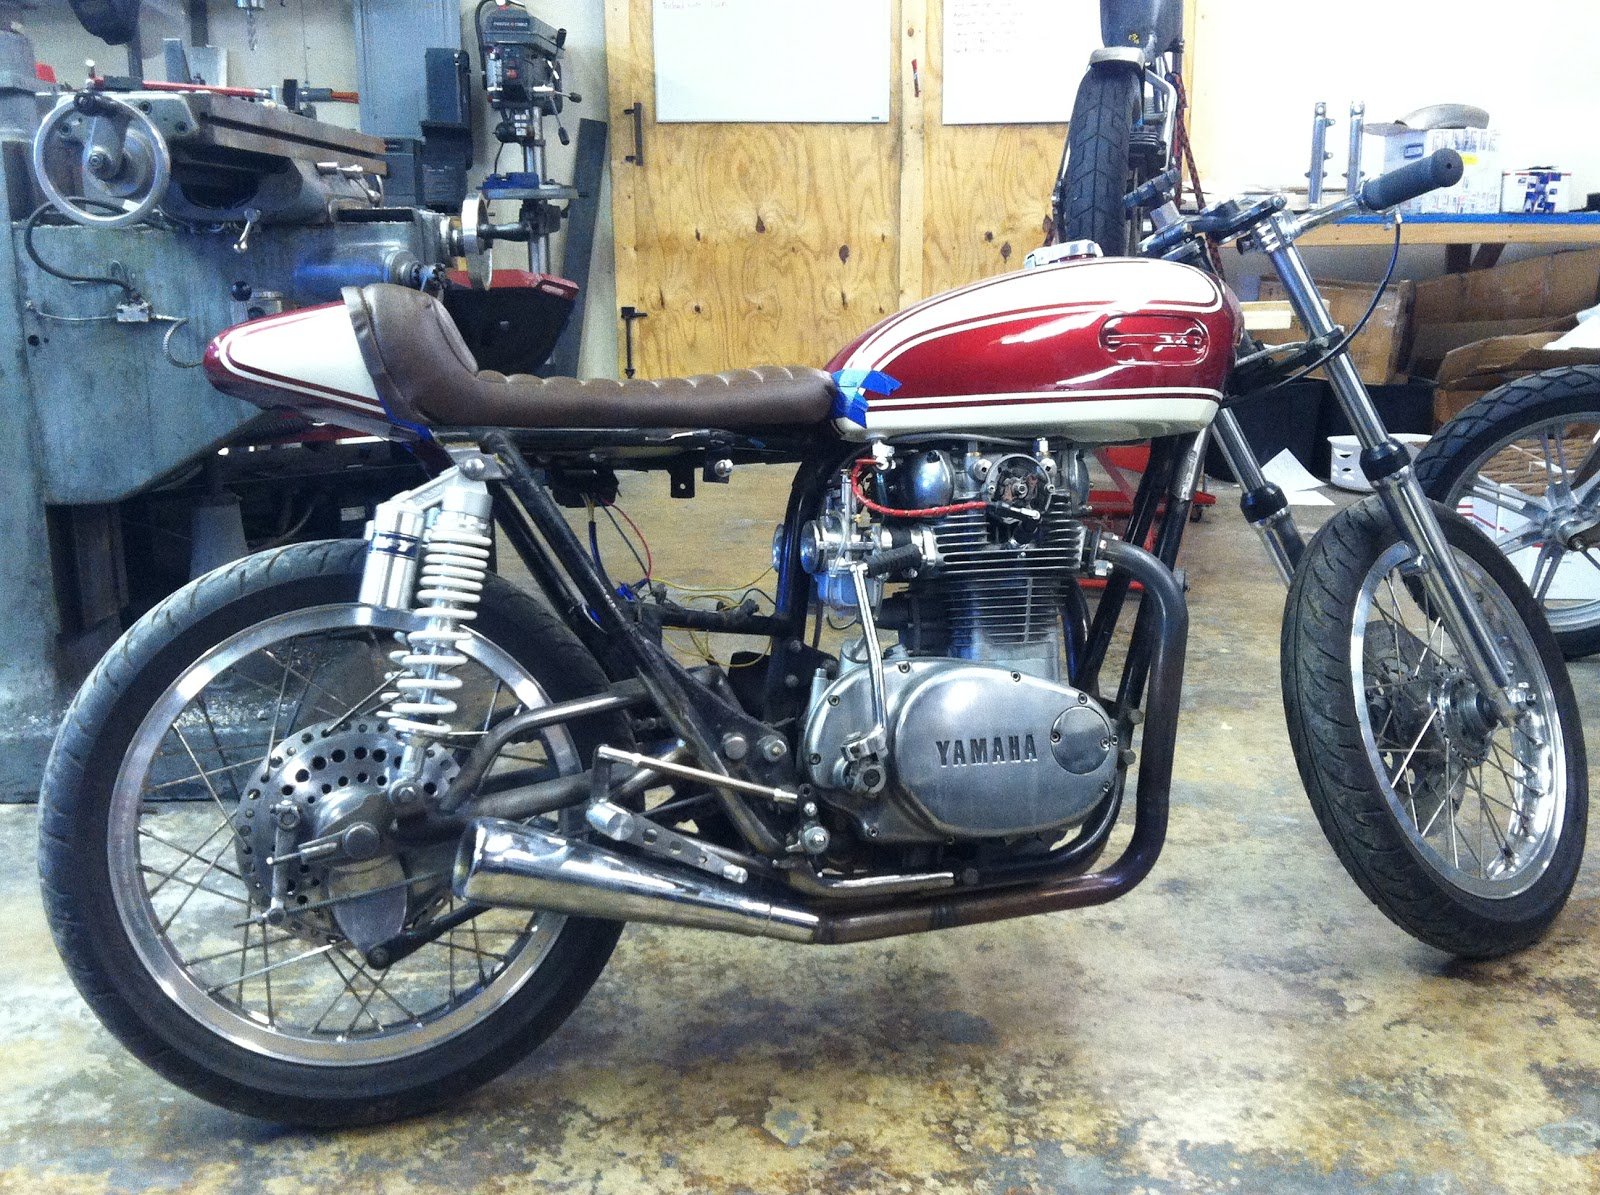 74-Up chopper bobber hardtail cafe racer Hughs HandBuilt XS650 Motor Mount Kit